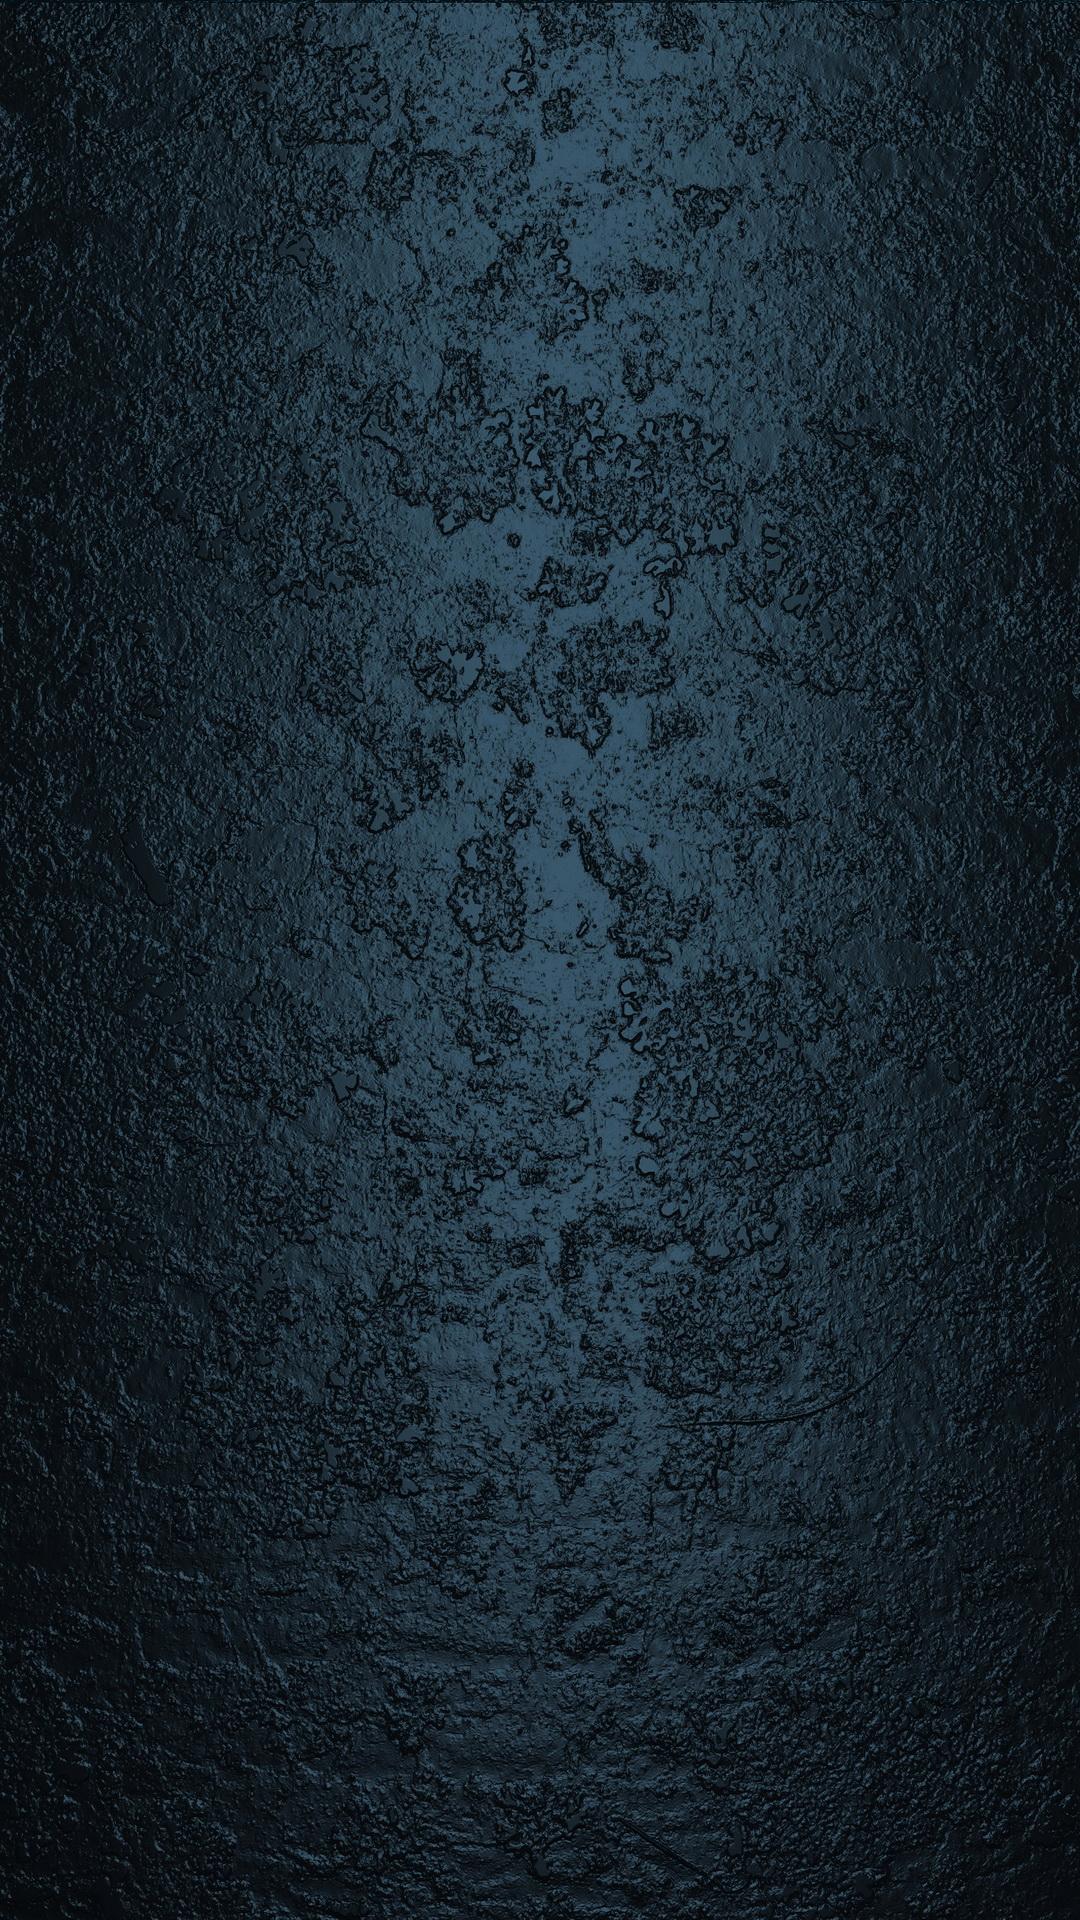 Blue Metallic High Defination iPhone Wallpapers